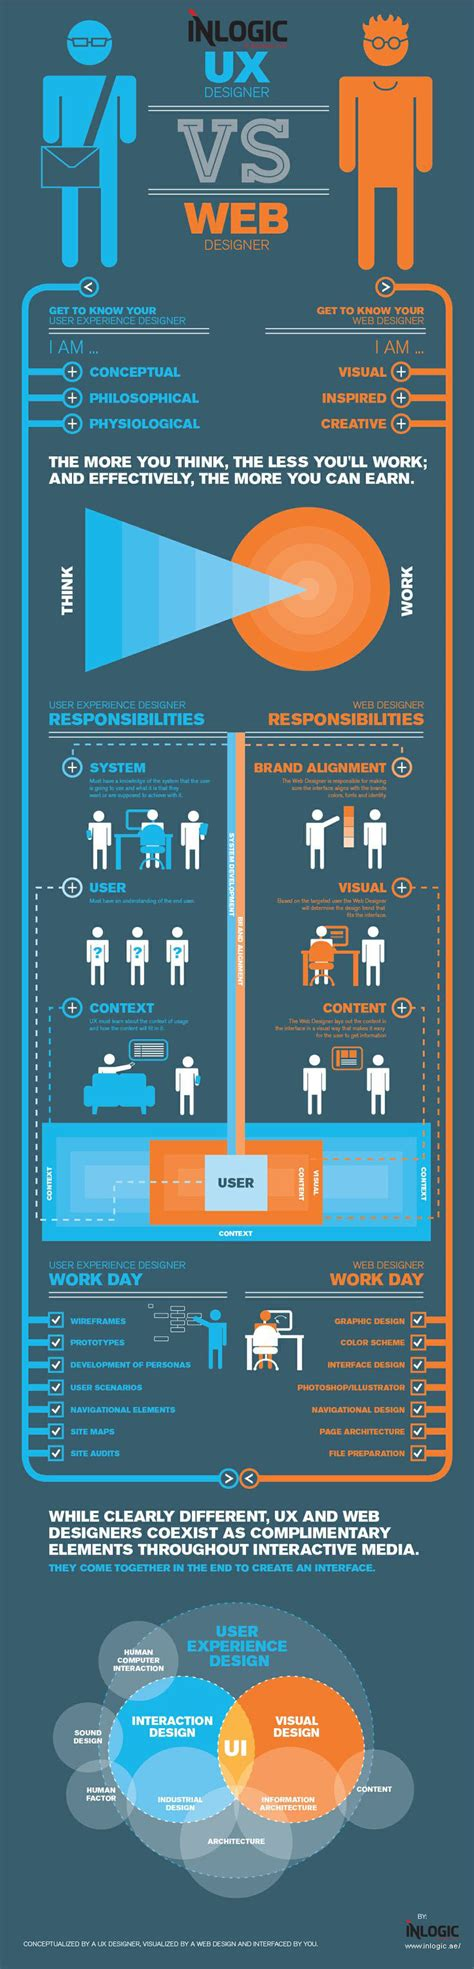 dubai web difference between dubai web designer and ux designer